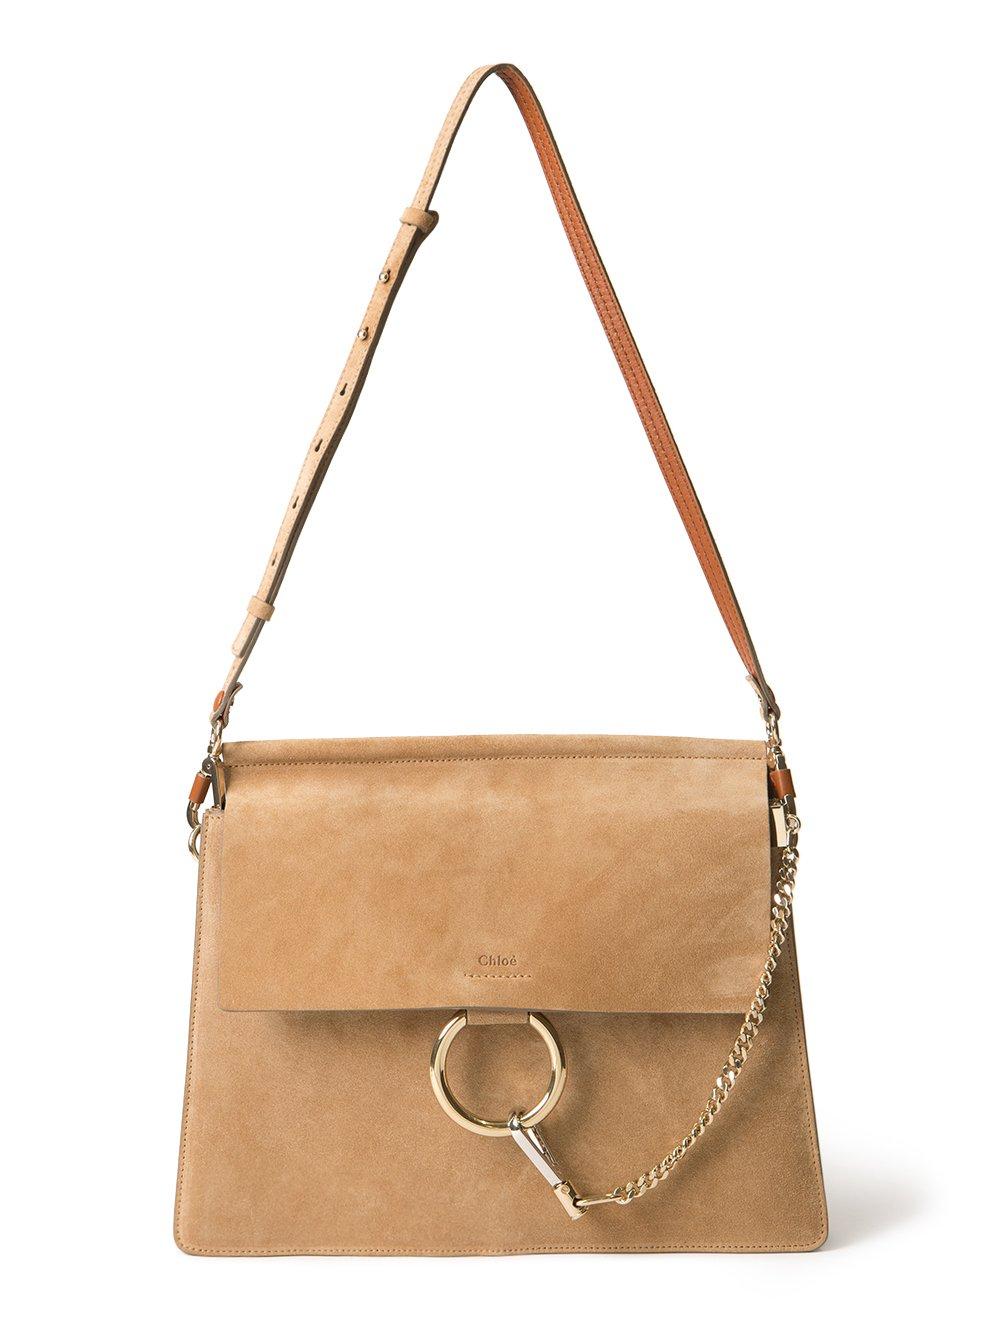 Chloe | Faye suede shoulder bag